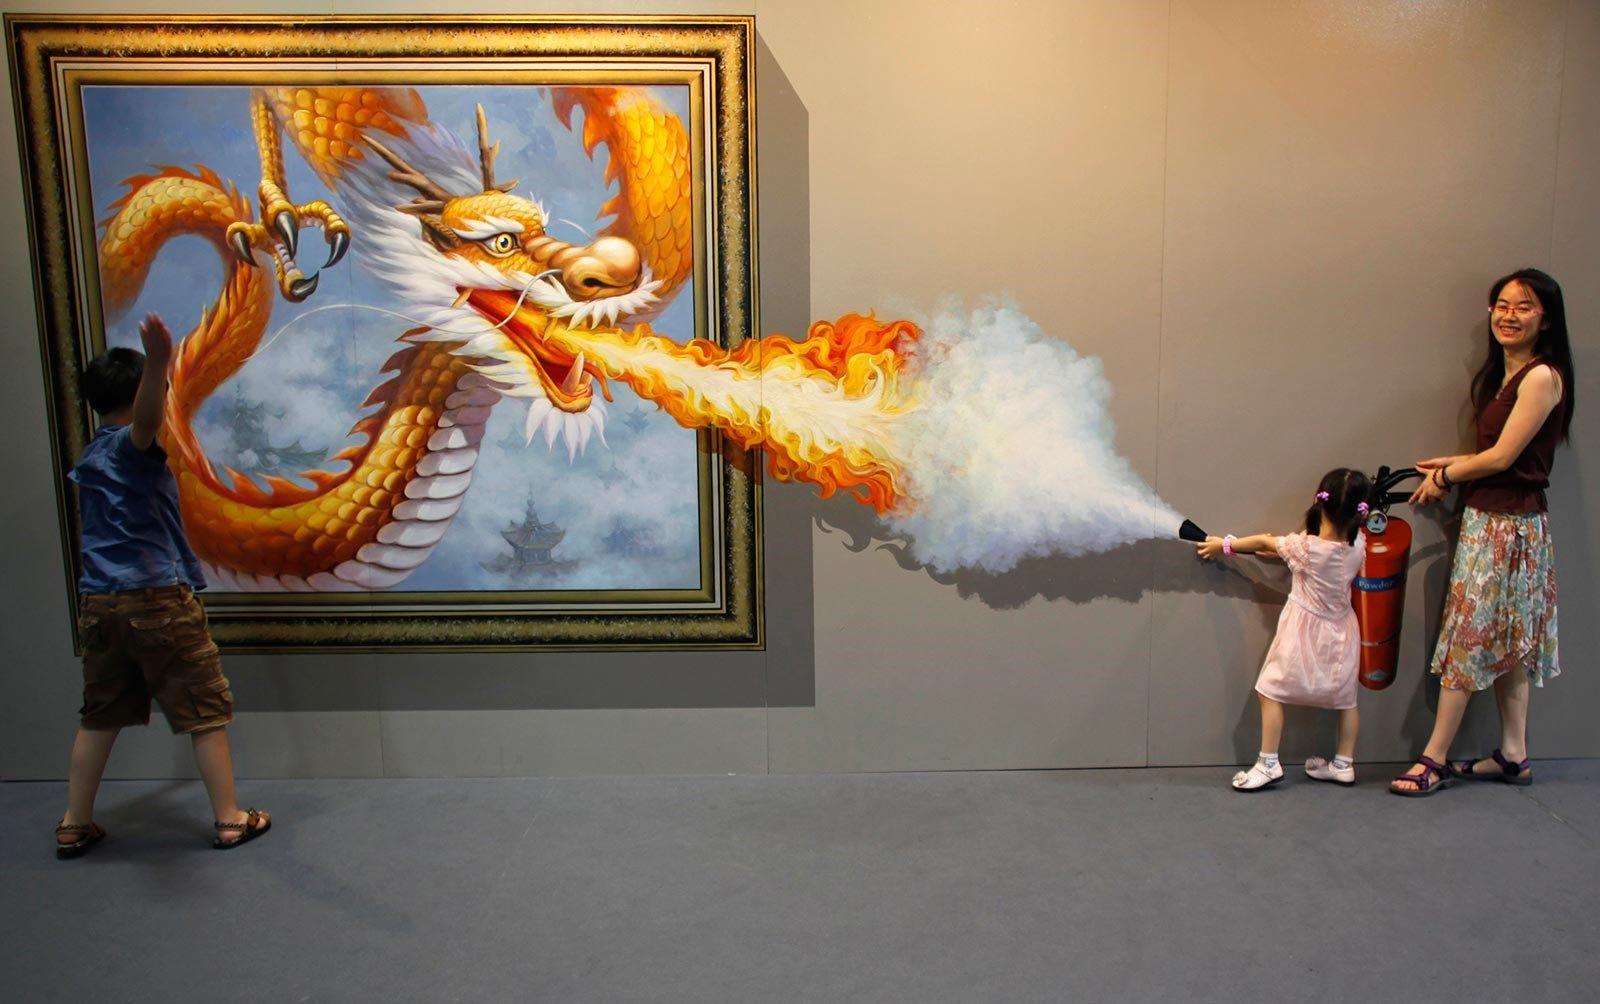 Photos illusion car moving optical illusion spectacular optical - Cool Optical Illusion We Love The Orange And Use Of Fire To Create